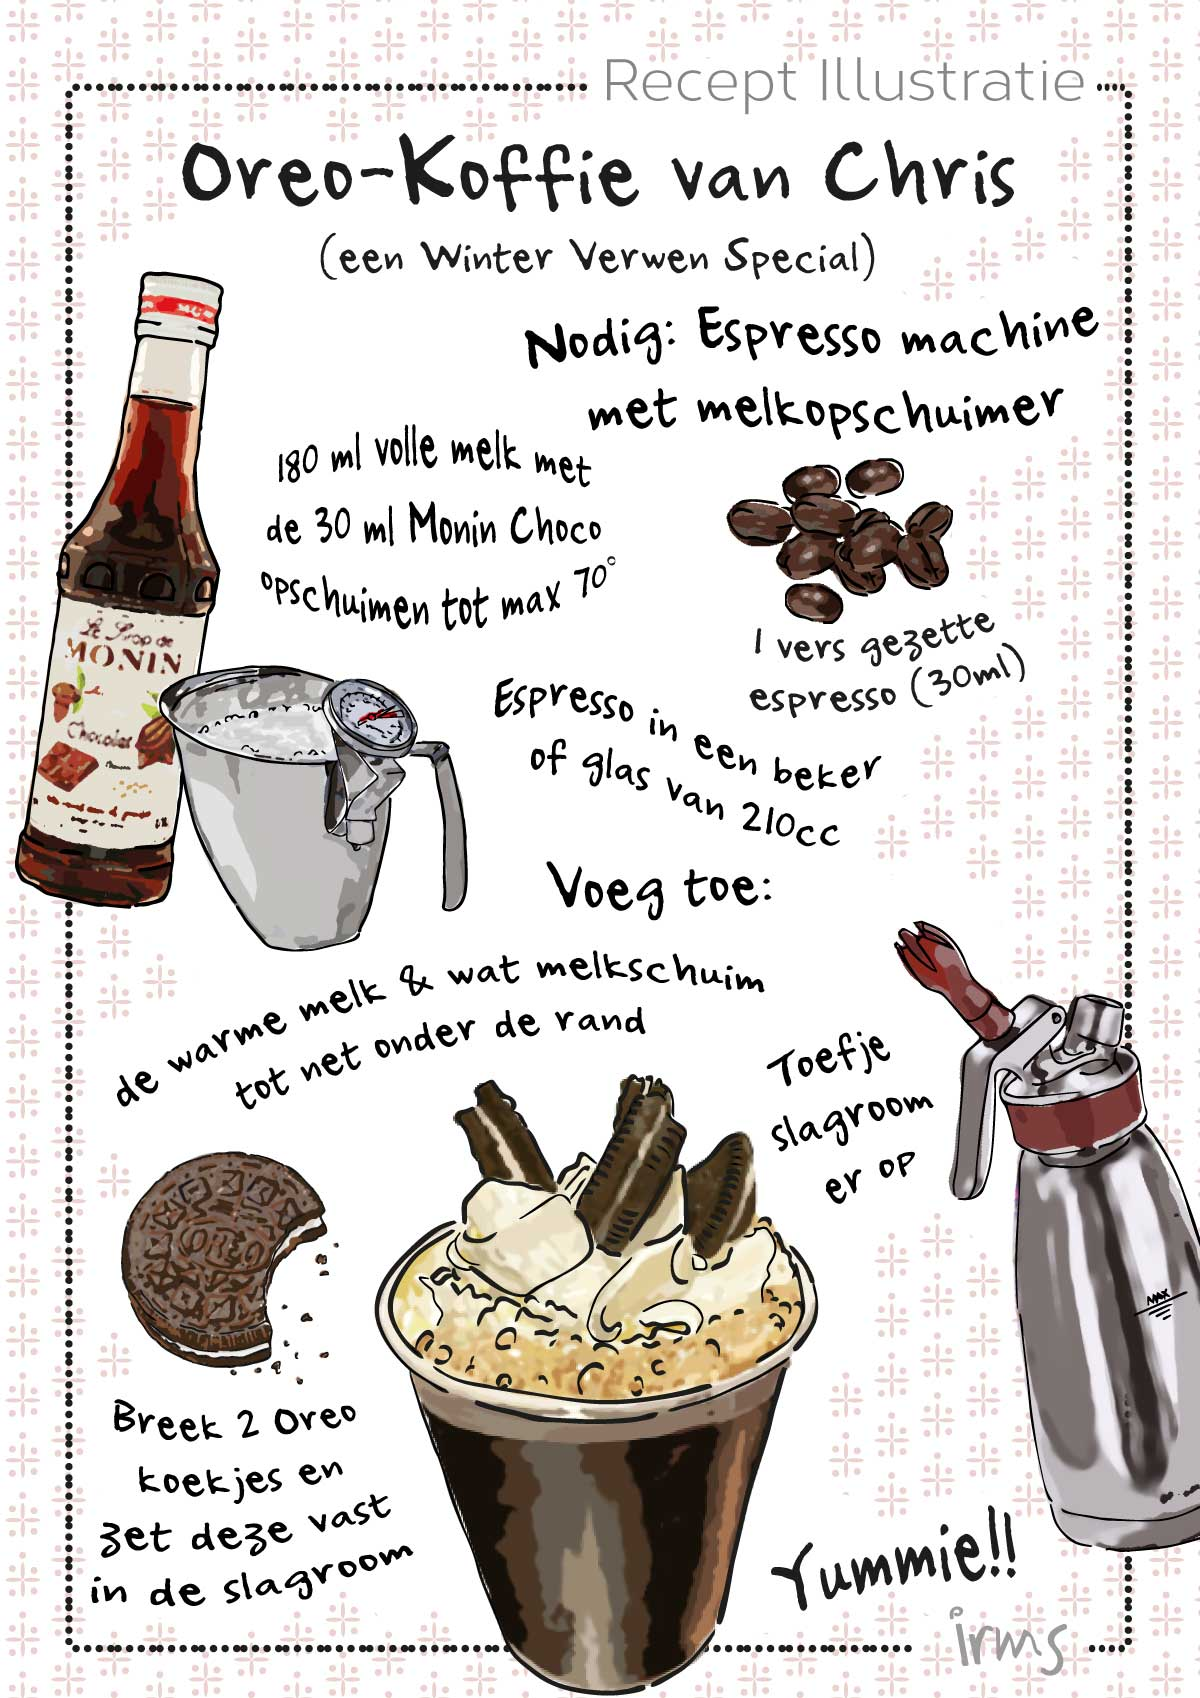 oreo-koffie-recept-illustratie-irms